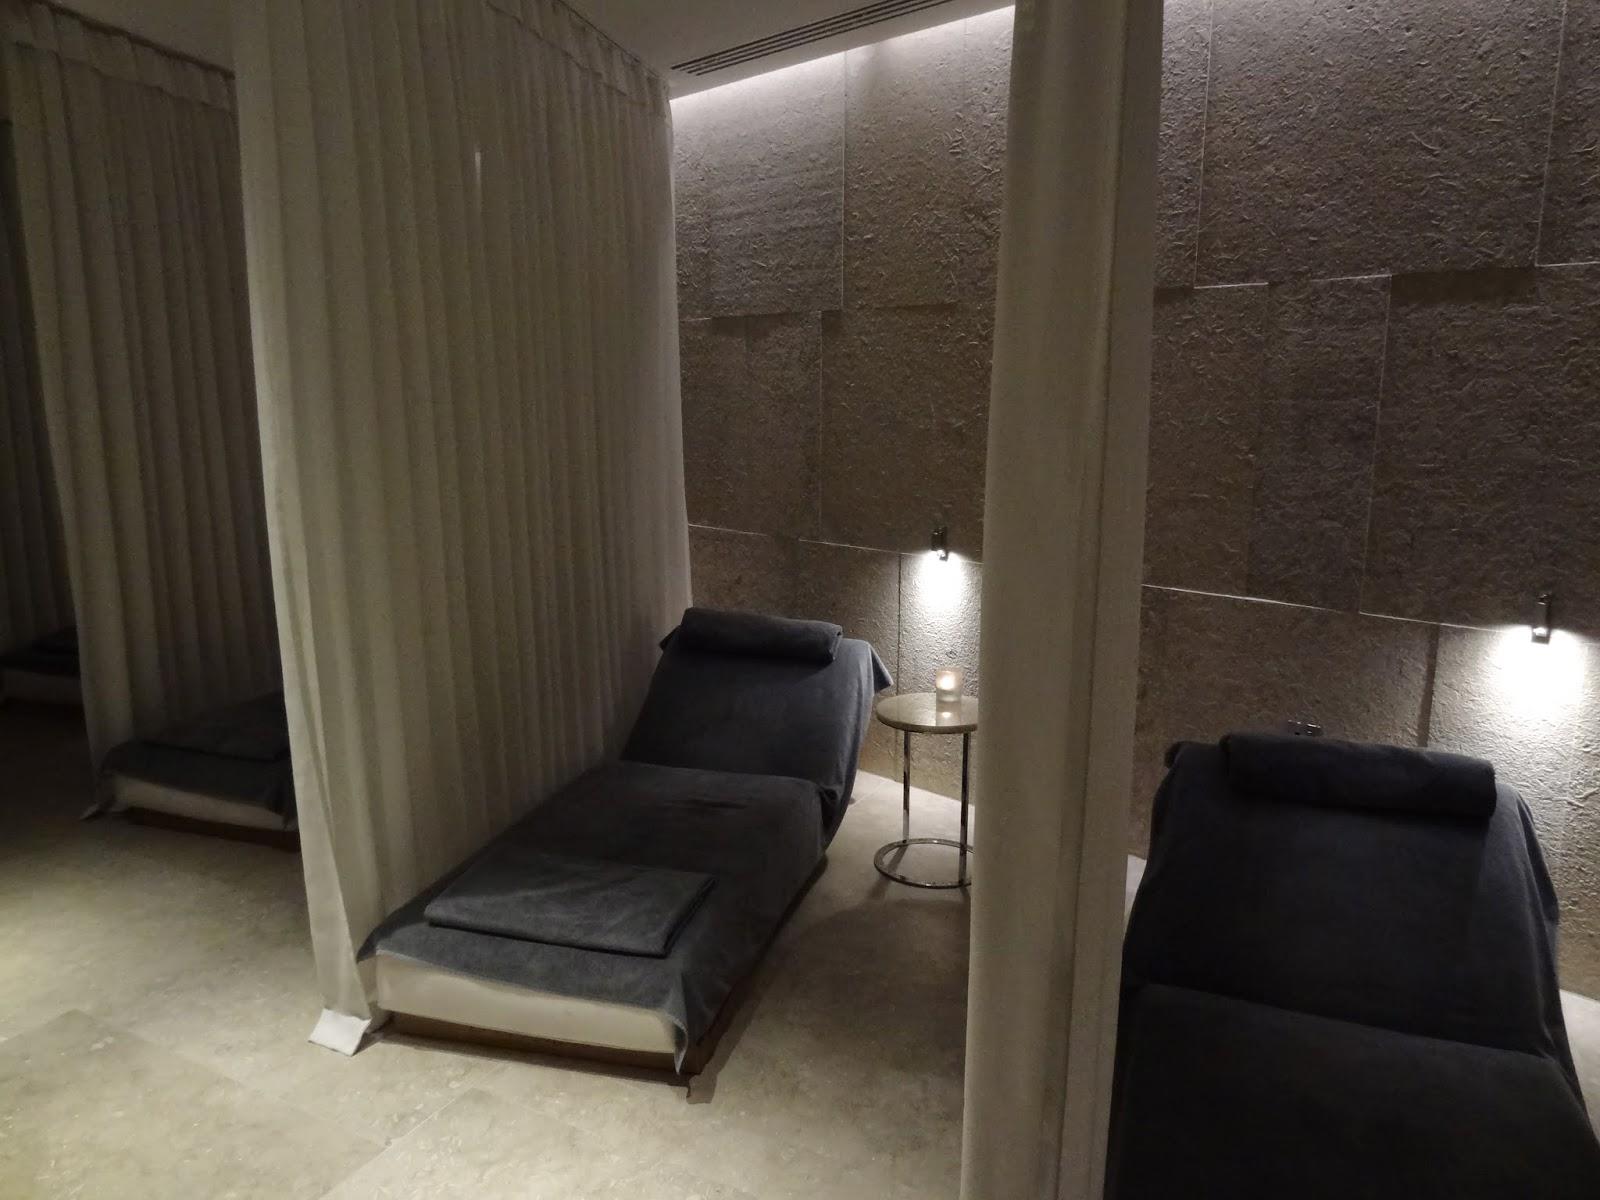 TBE+Bulgari+Spa+Relaxation+Room.JPG